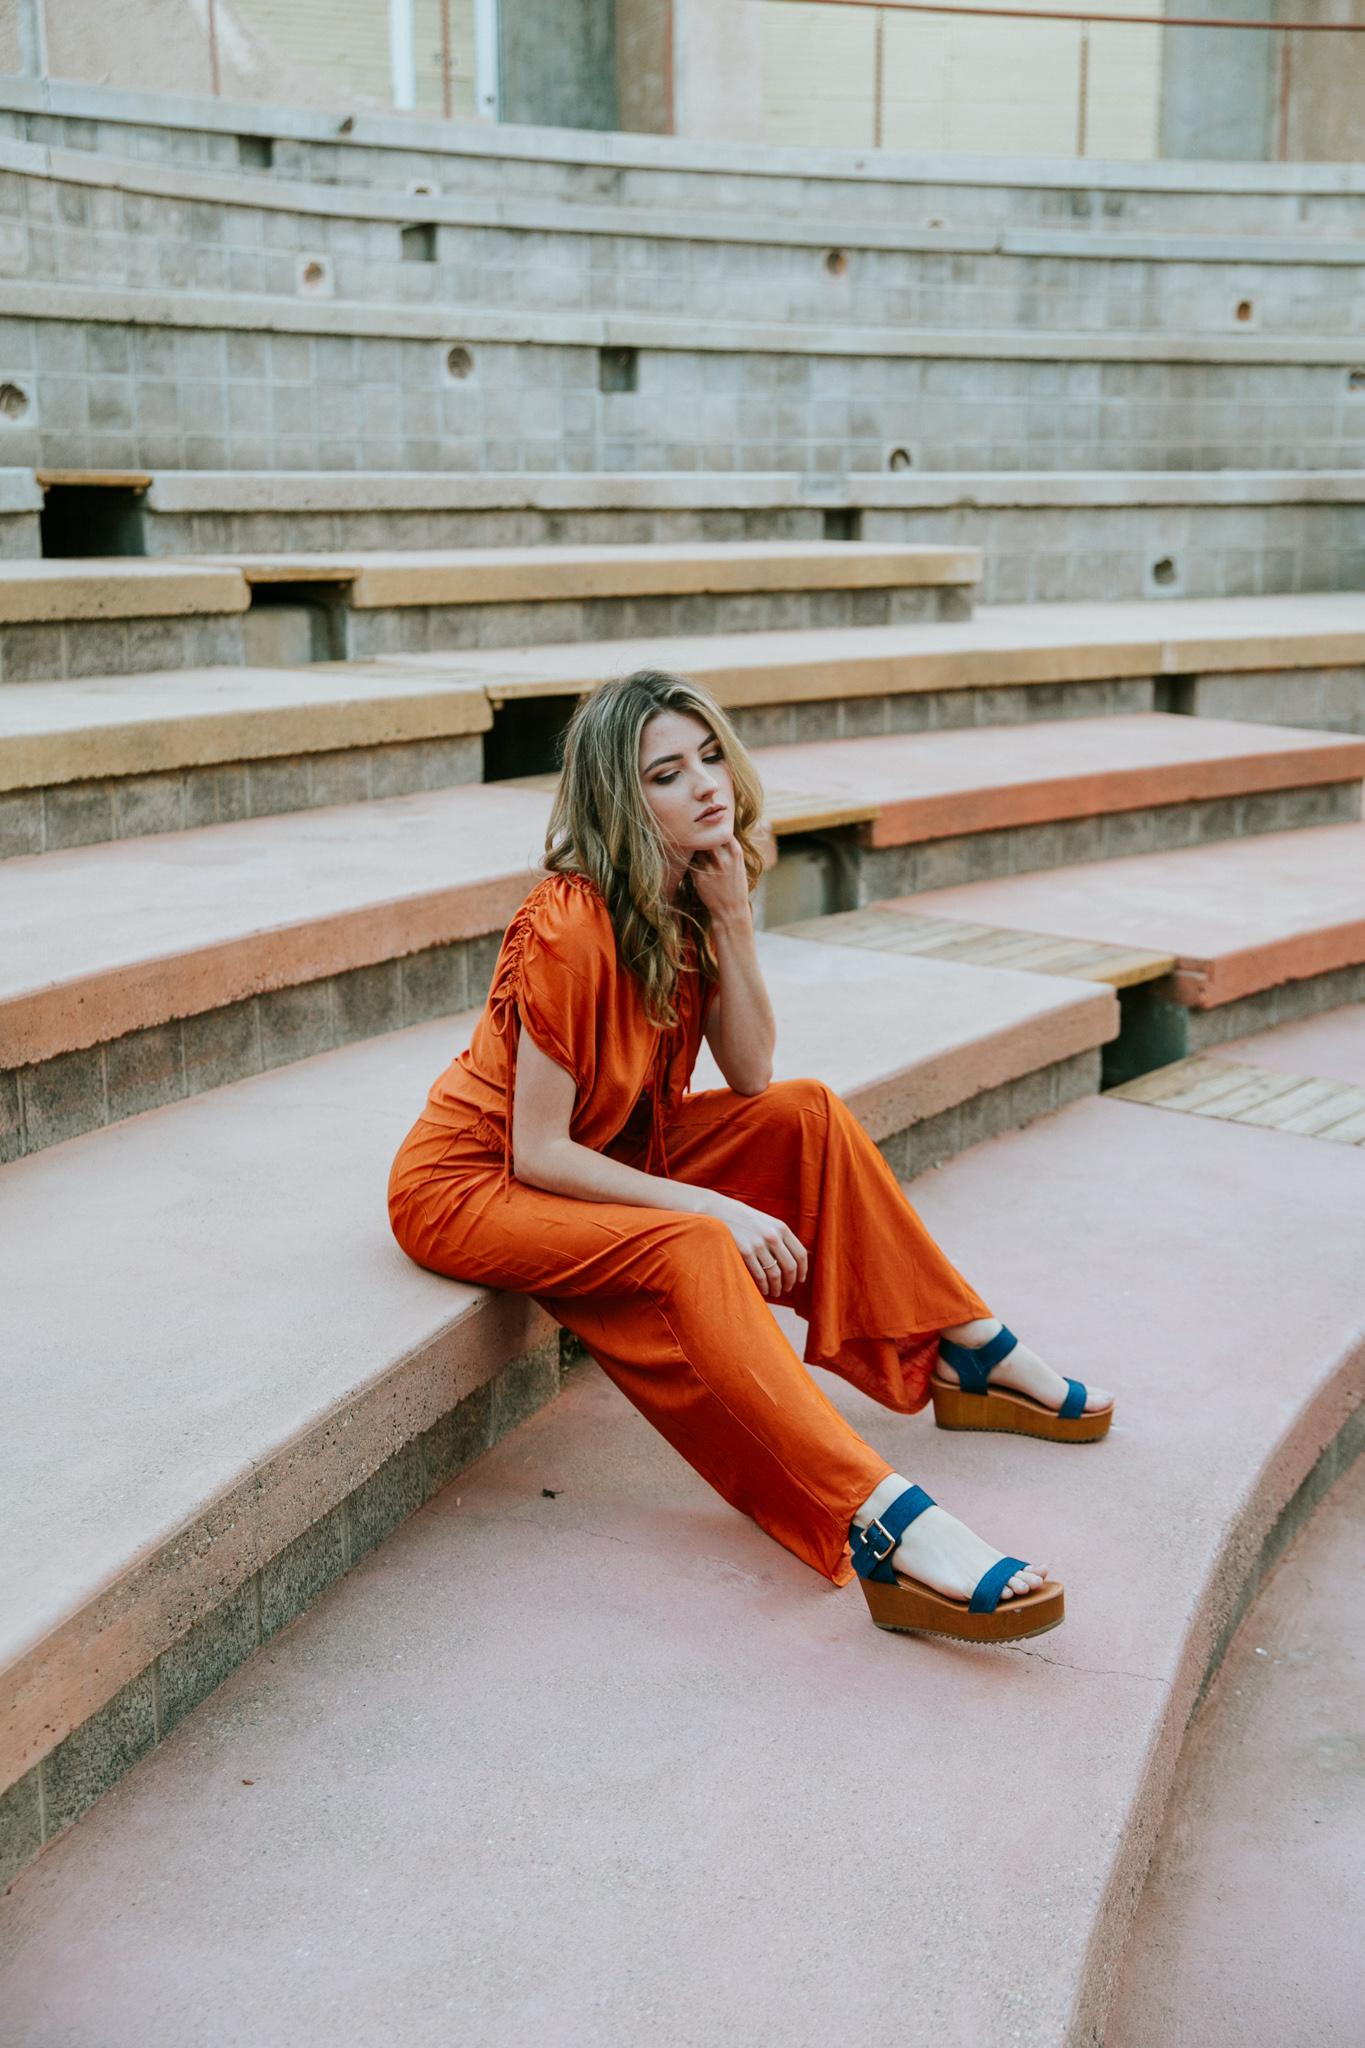 ChelseaScottEvans-Arcosanti-061.jpg